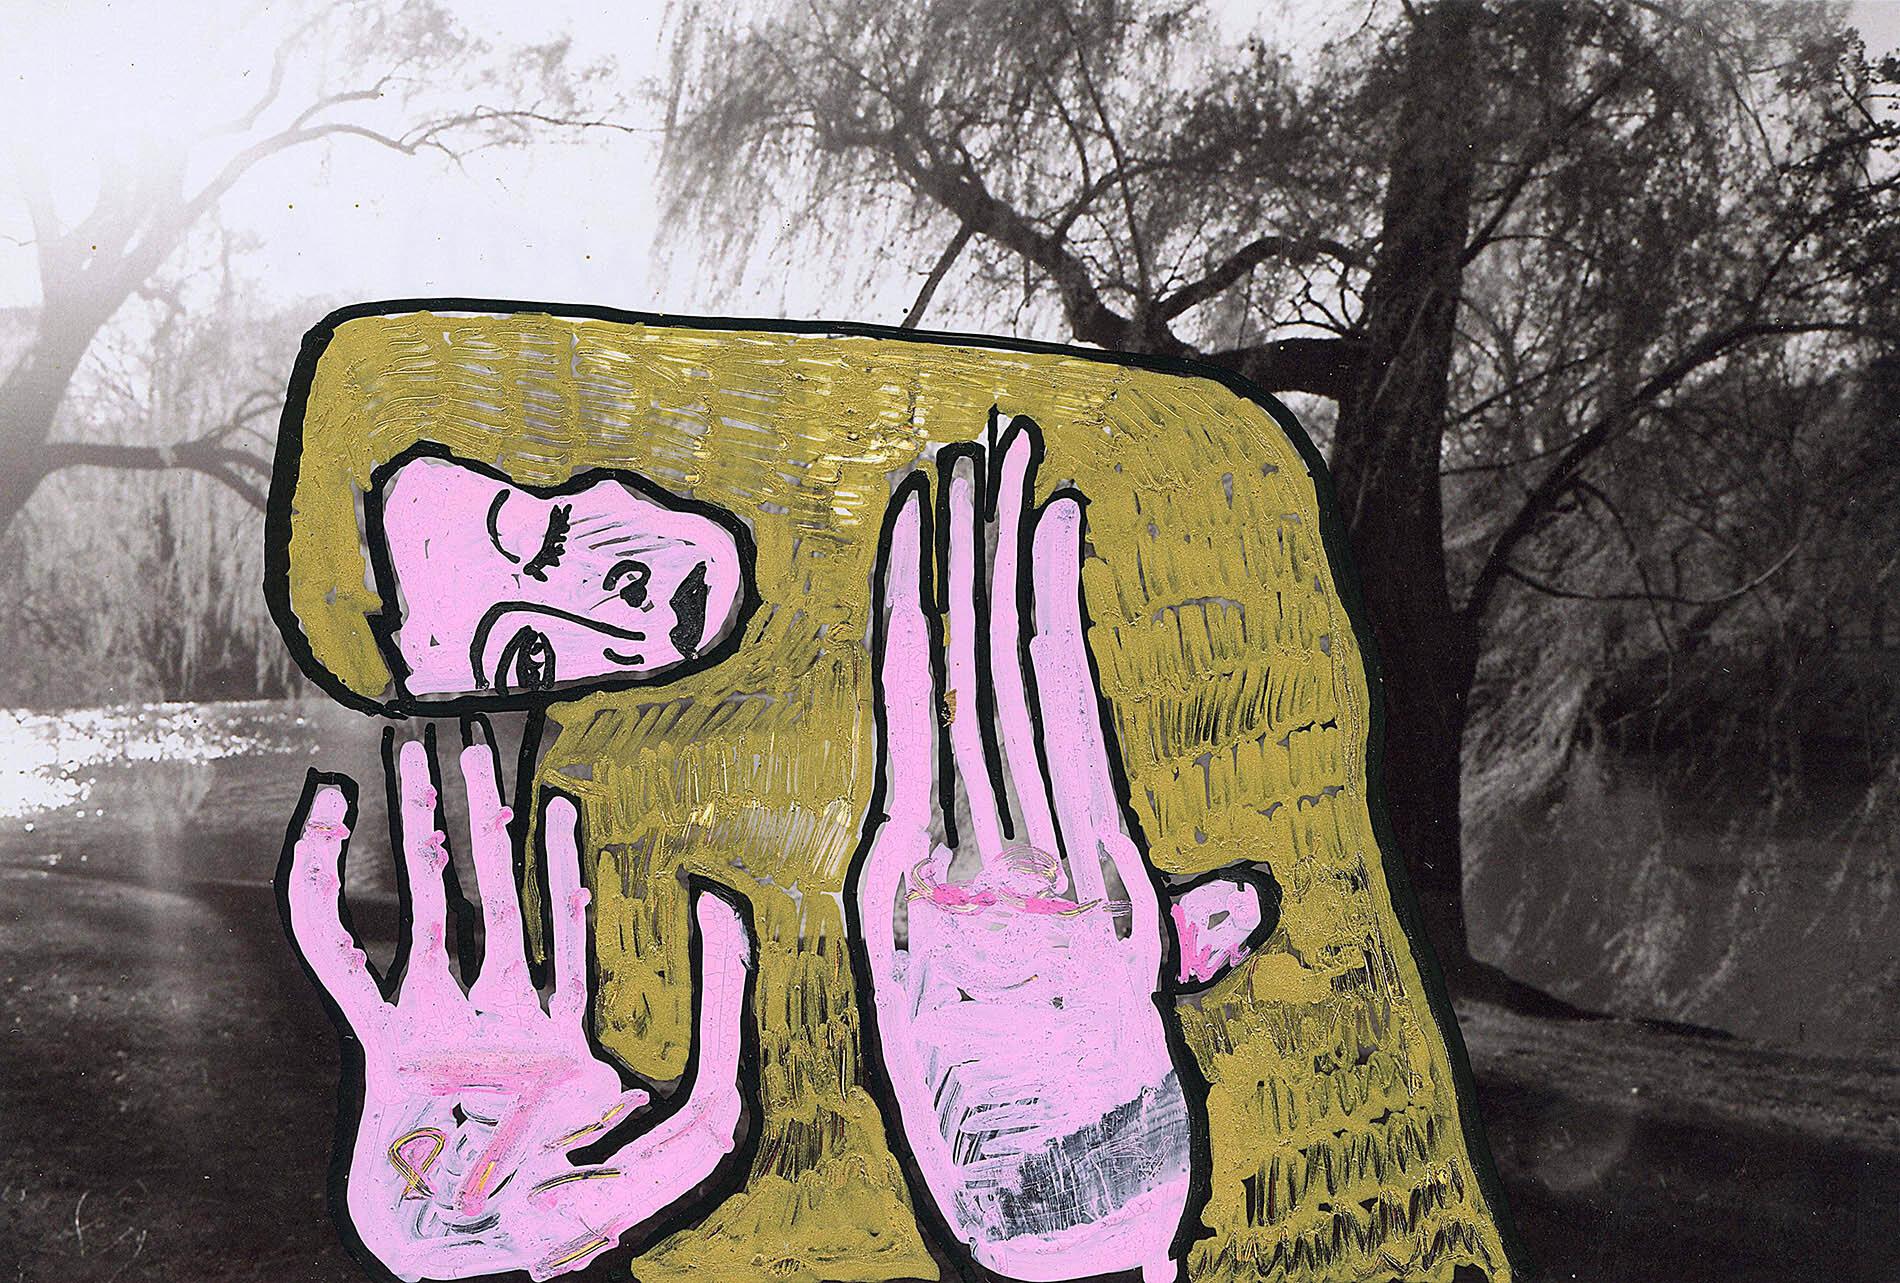 'Central Park with Gustav Klimt' 2015, Berlin, Inkjet photograph & Acrylic, 10x15cm